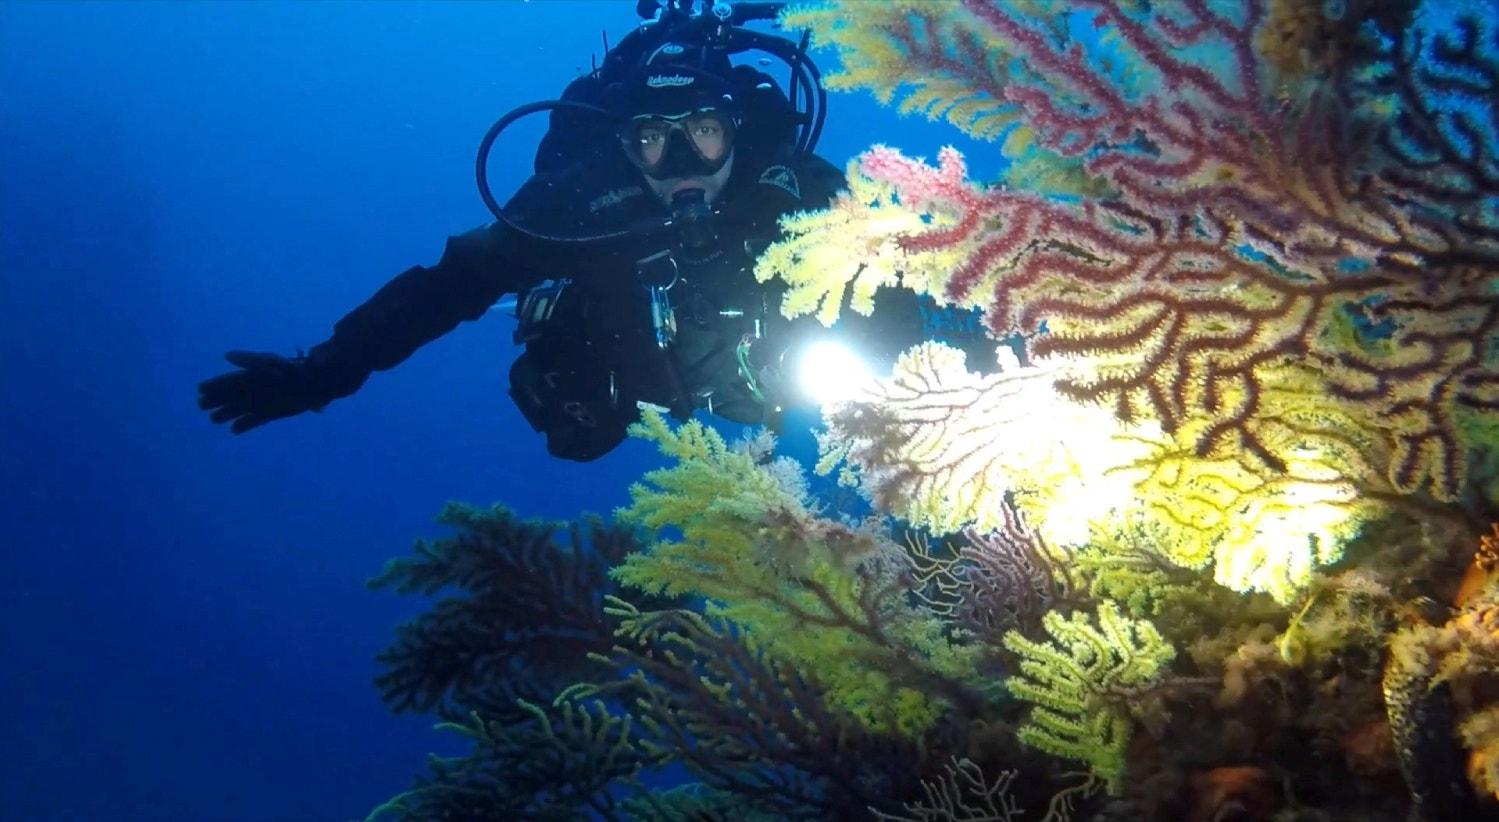 Itália, barreira de coral Secche di Tor Paterno, em abril | Guarda Costeira Italiana - Reuters